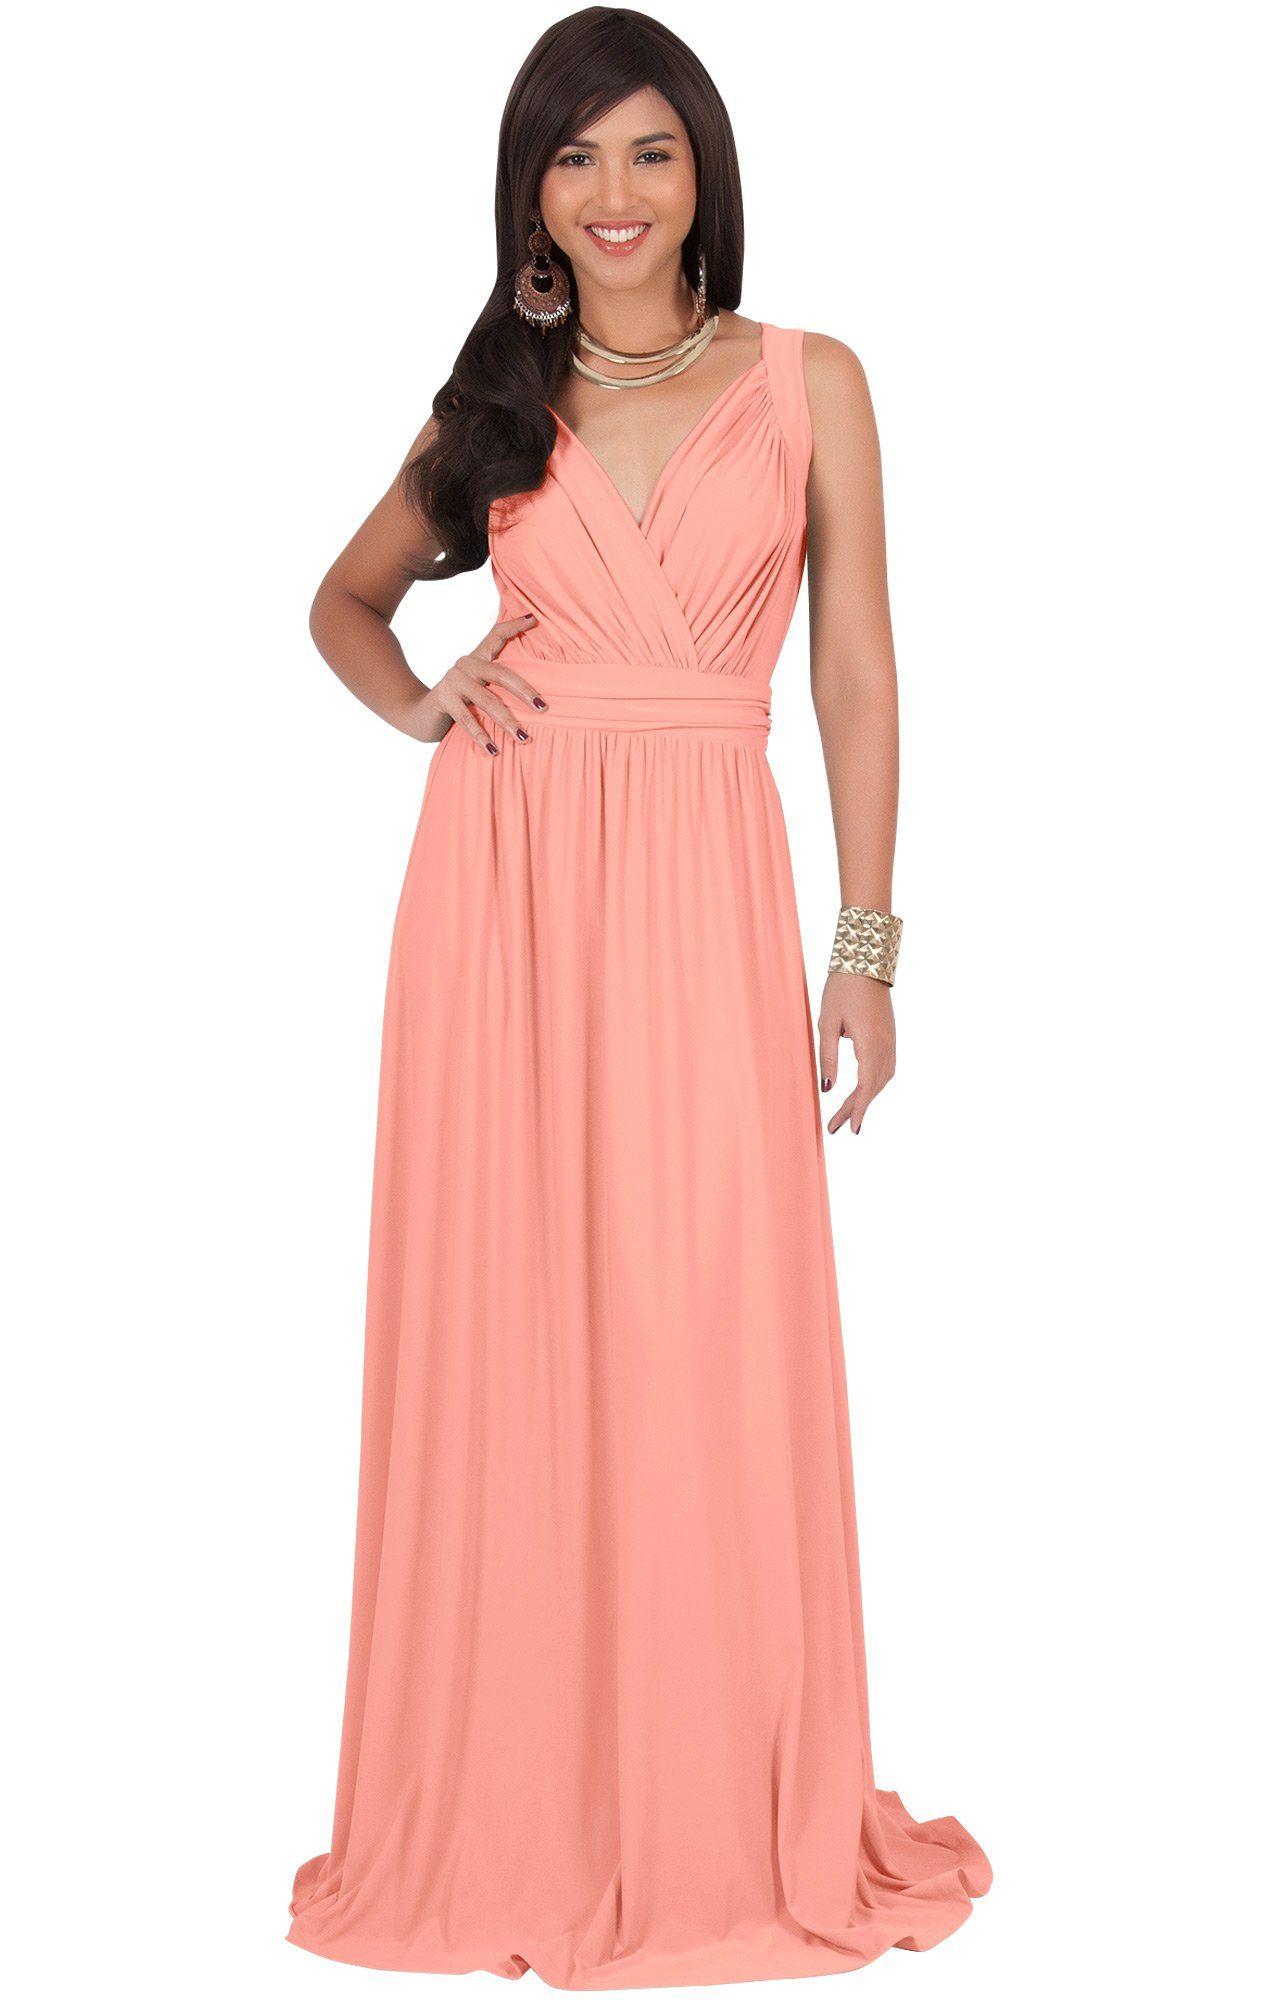 Plus size summer wedding dresses  KOH KOH Plus Size Womens Long Sleeveless Flowy Bridesmaids Cocktail